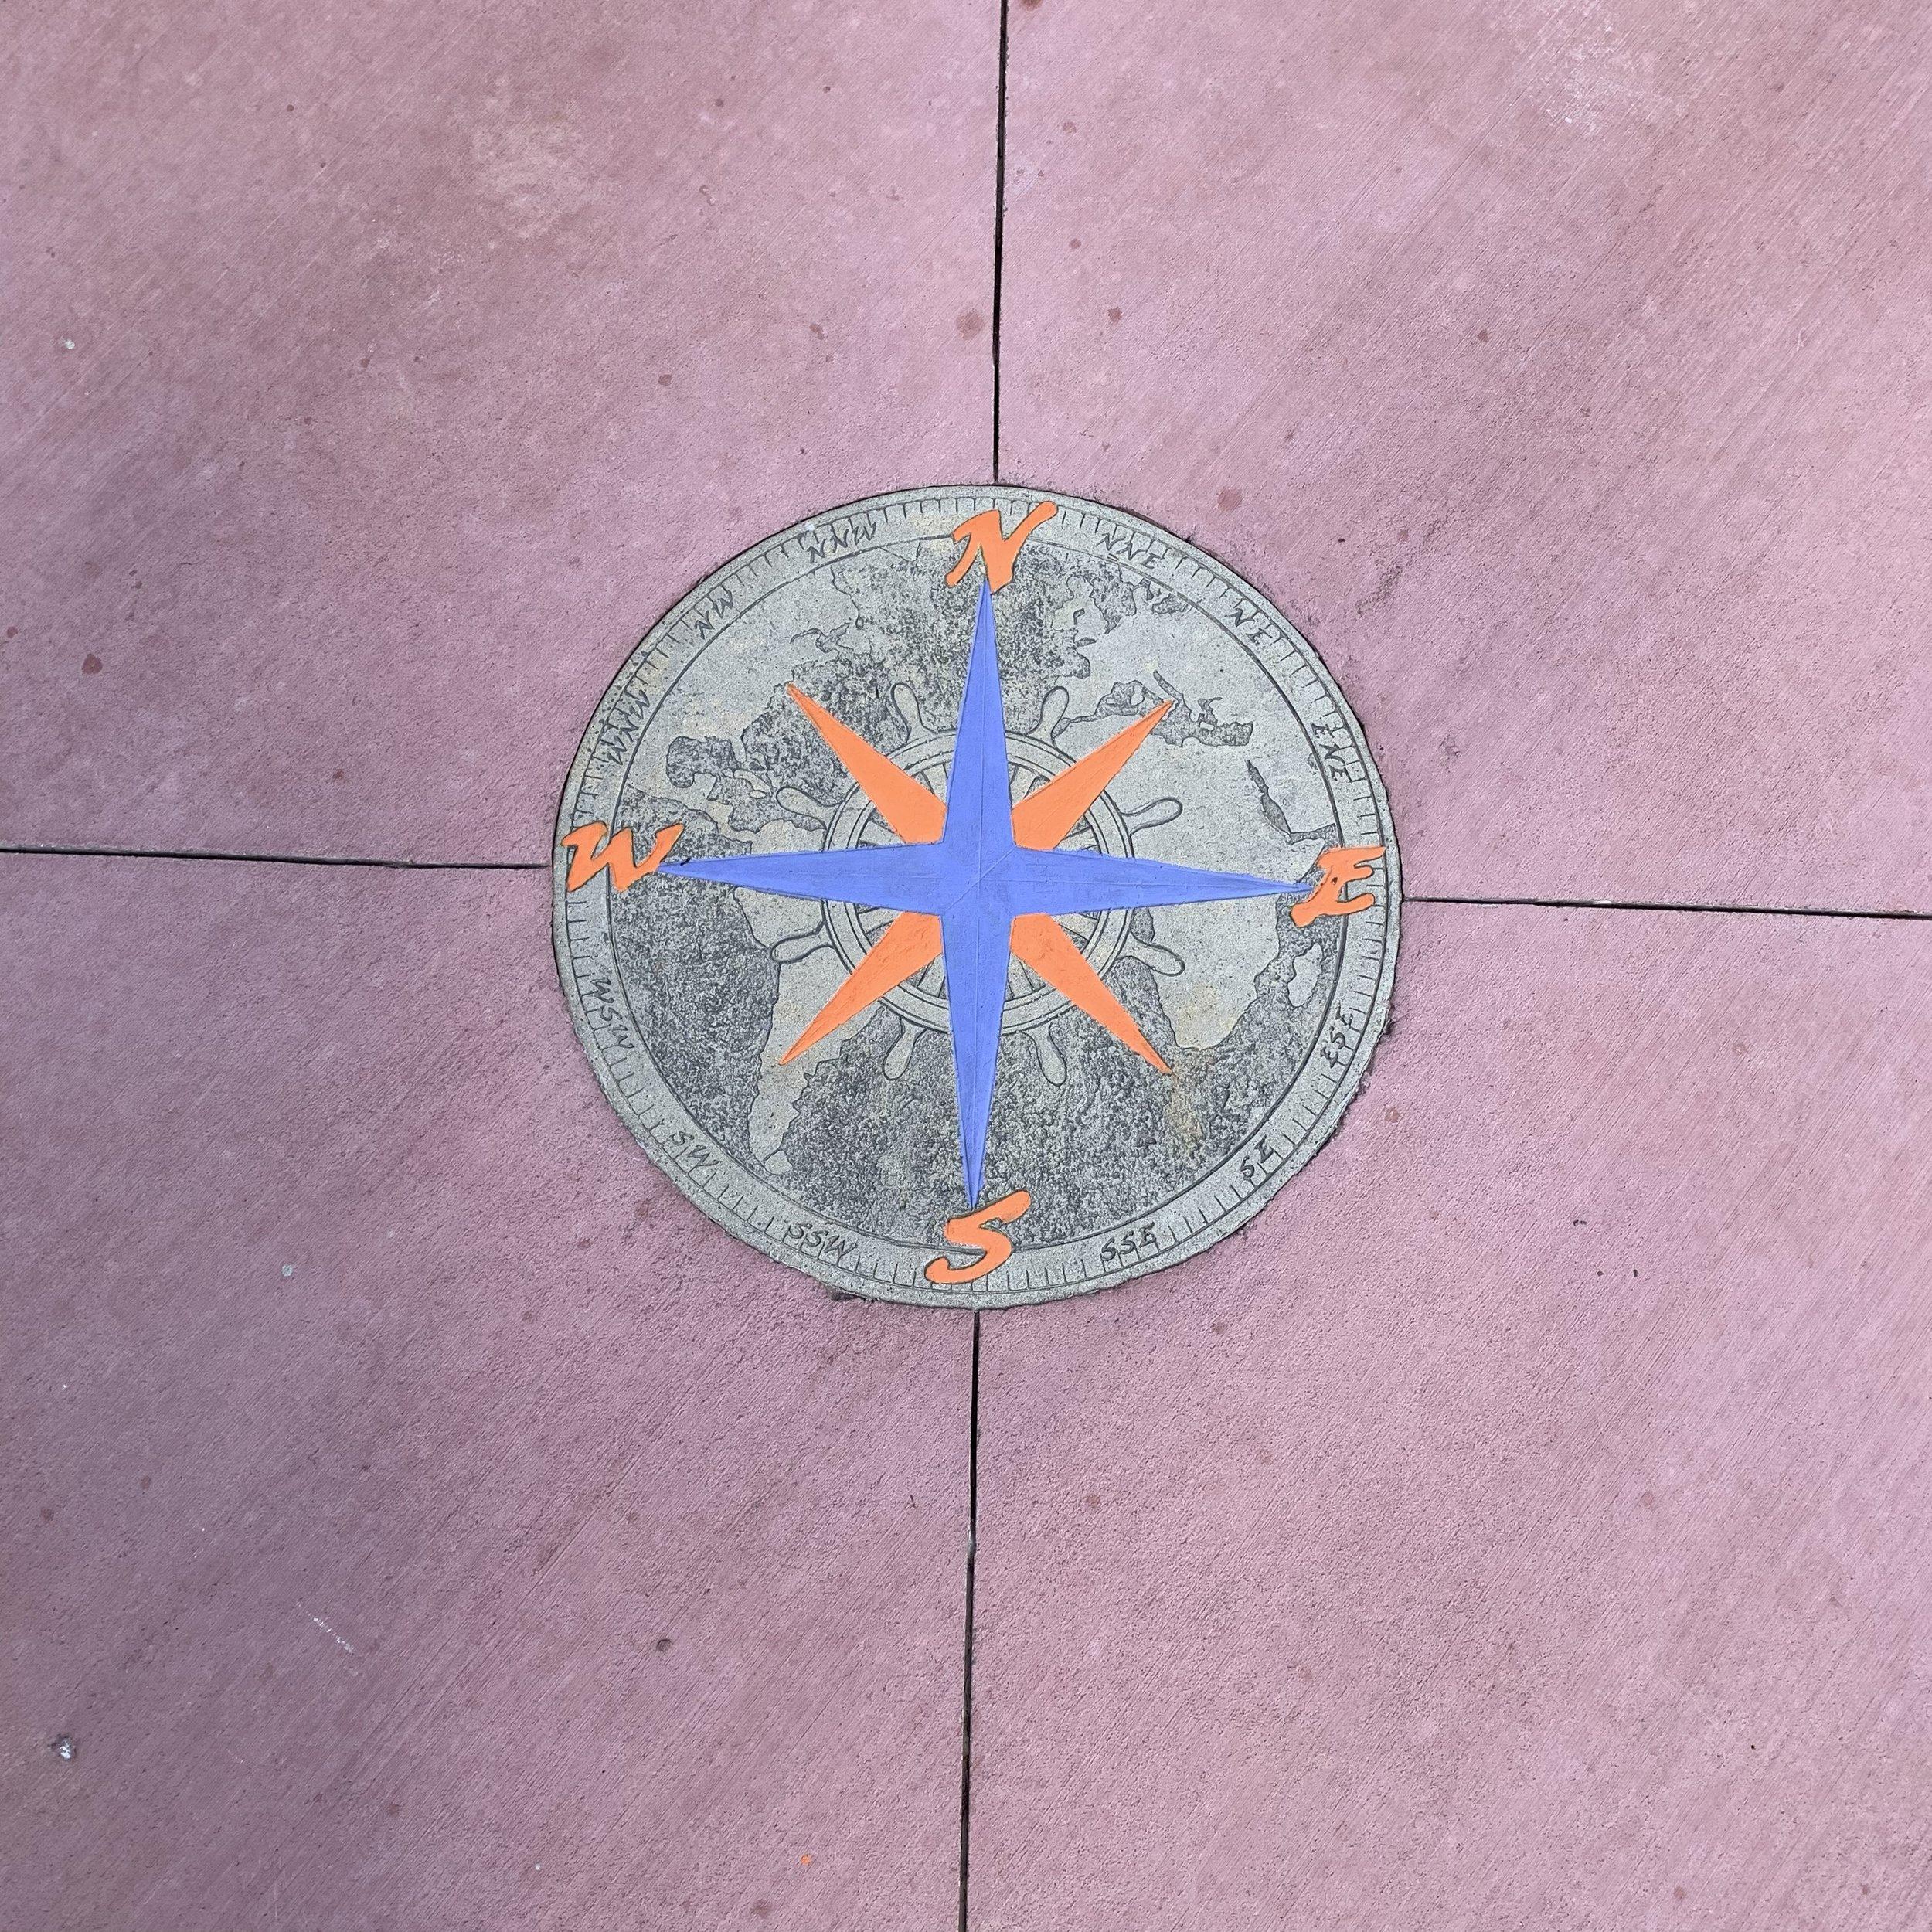 Reclaimed compass from Garfield Park